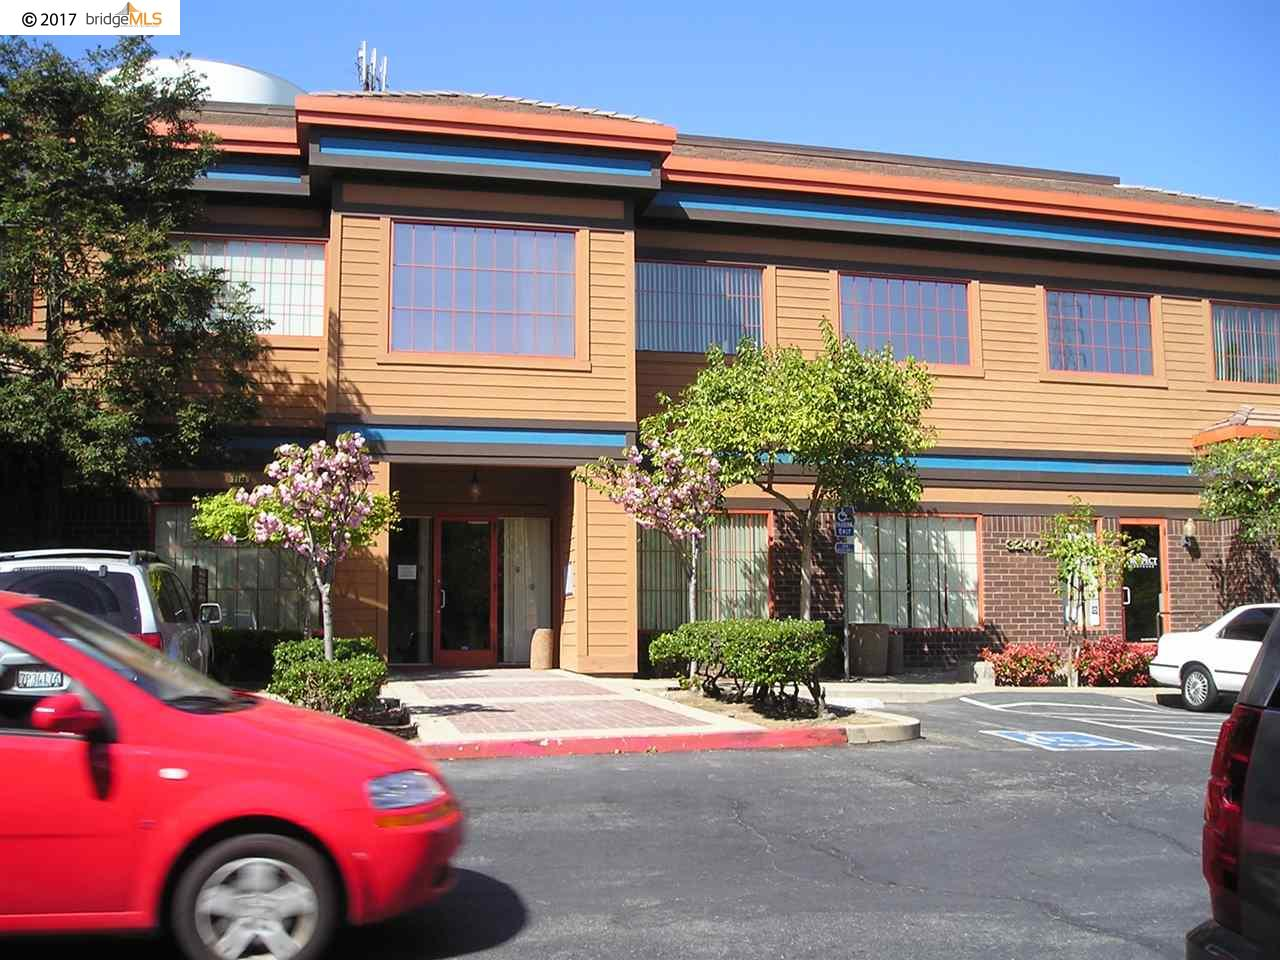 3240 Lone Tree Way, Ste 202 3240 Lone Tree Way, Ste 202 Antioch, California 94509 United States